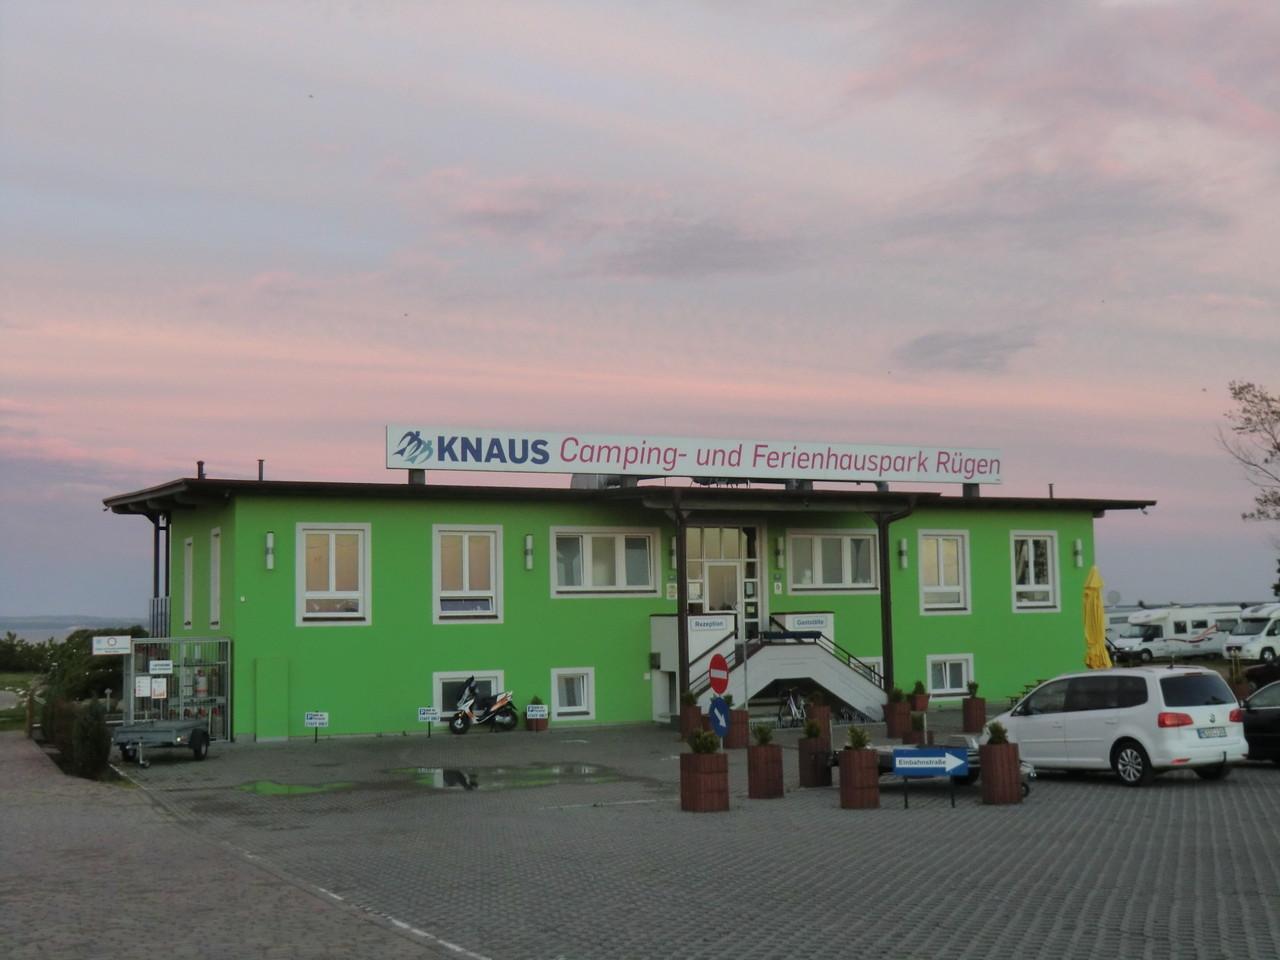 Knaus Campingpark Rügen